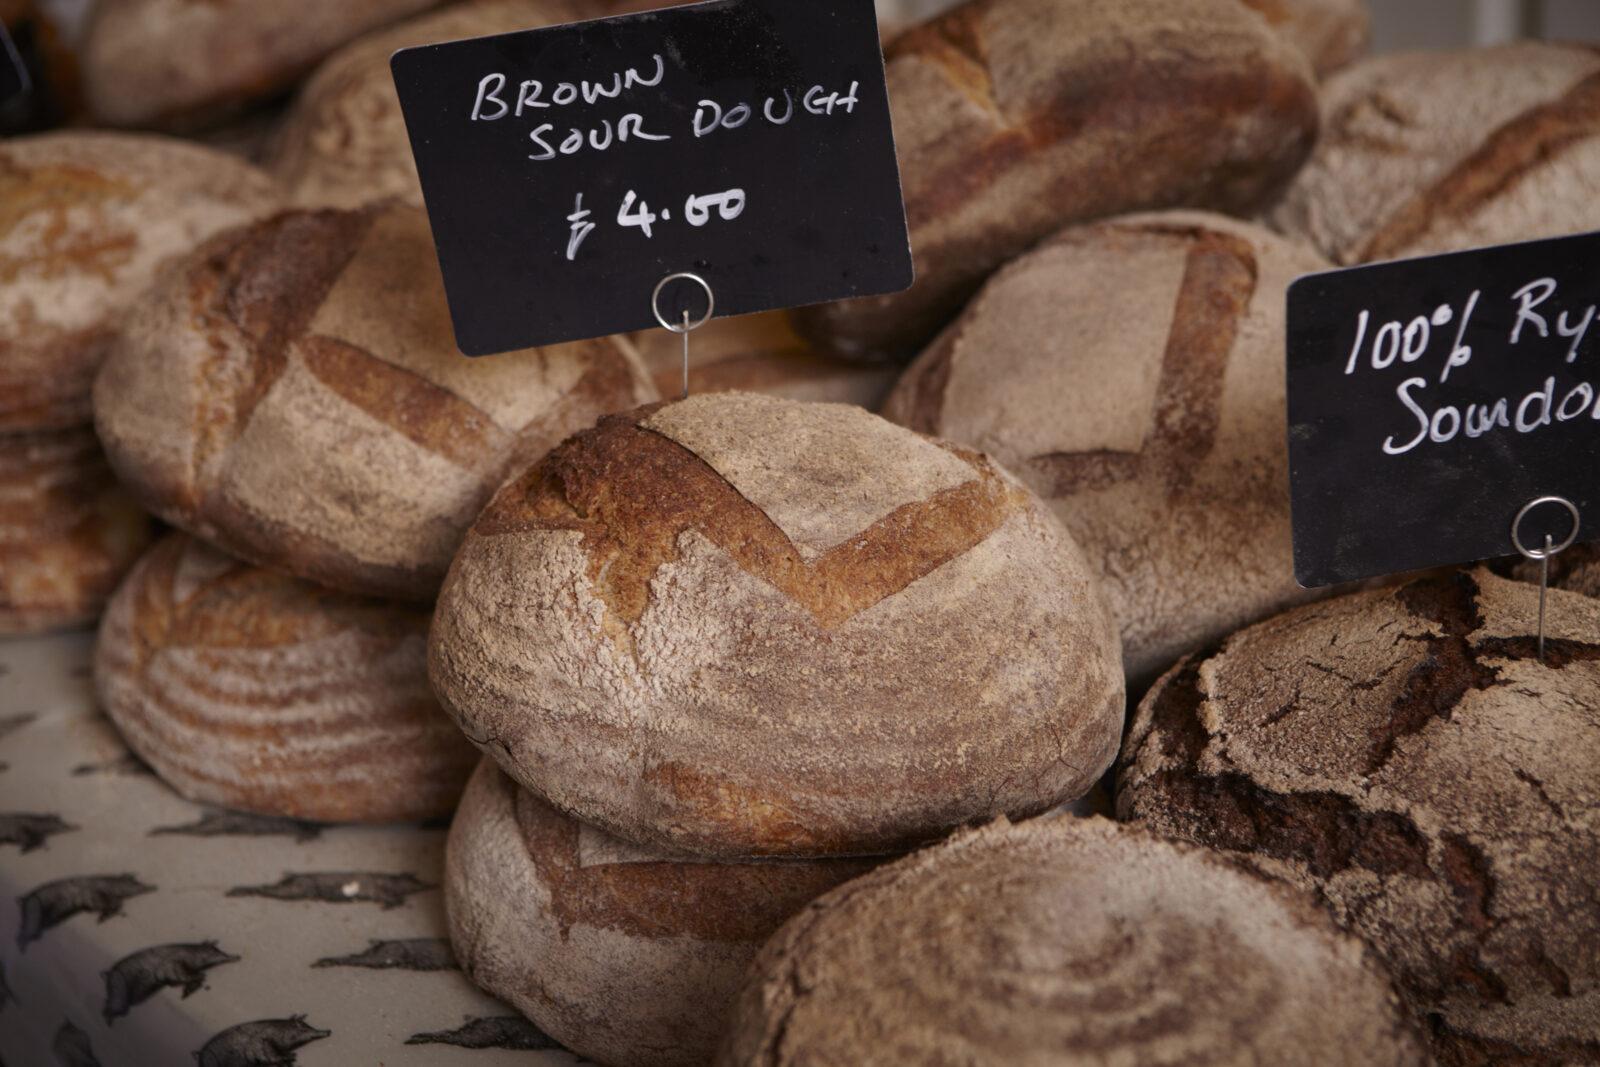 Sourdough-Loaves-02-Patricia-Niven-1600x1067.jpg